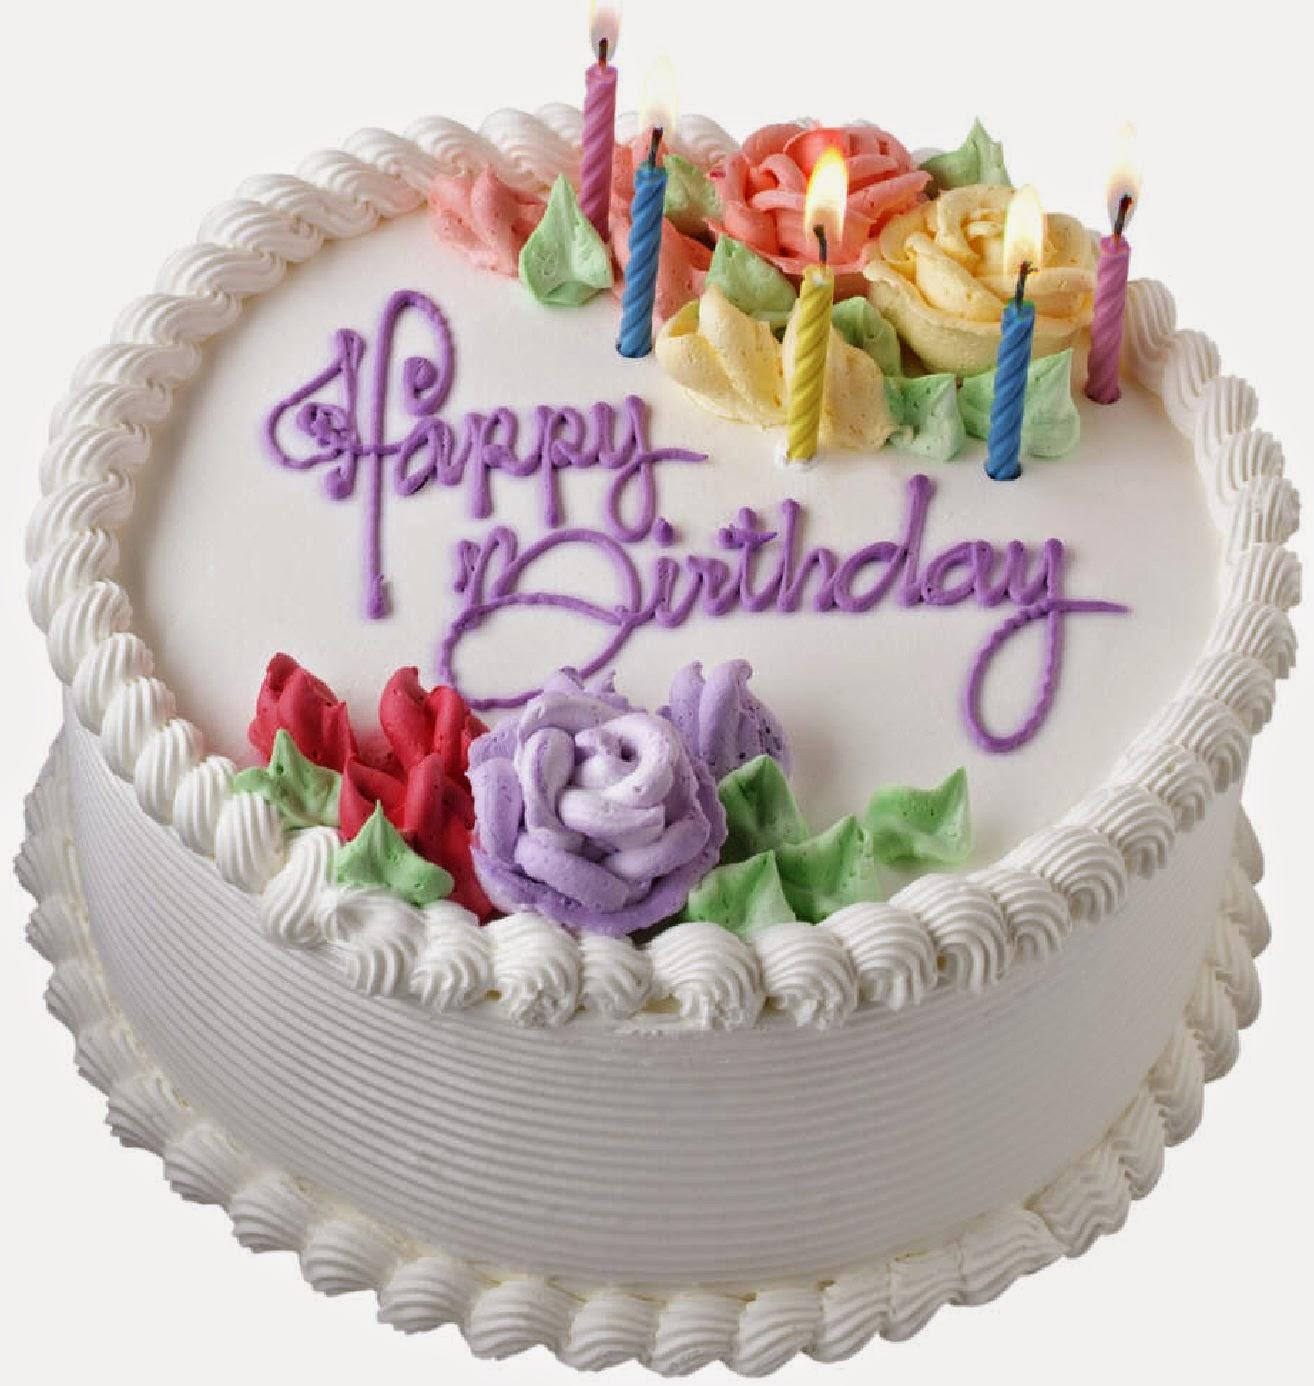 http://1.bp.blogspot.com/-dNYpynxCmNs/VMxxfhk252I/AAAAAAAAAI0/r9Nw2XXTKfc/s1600/BirthdayCake-300.jpg